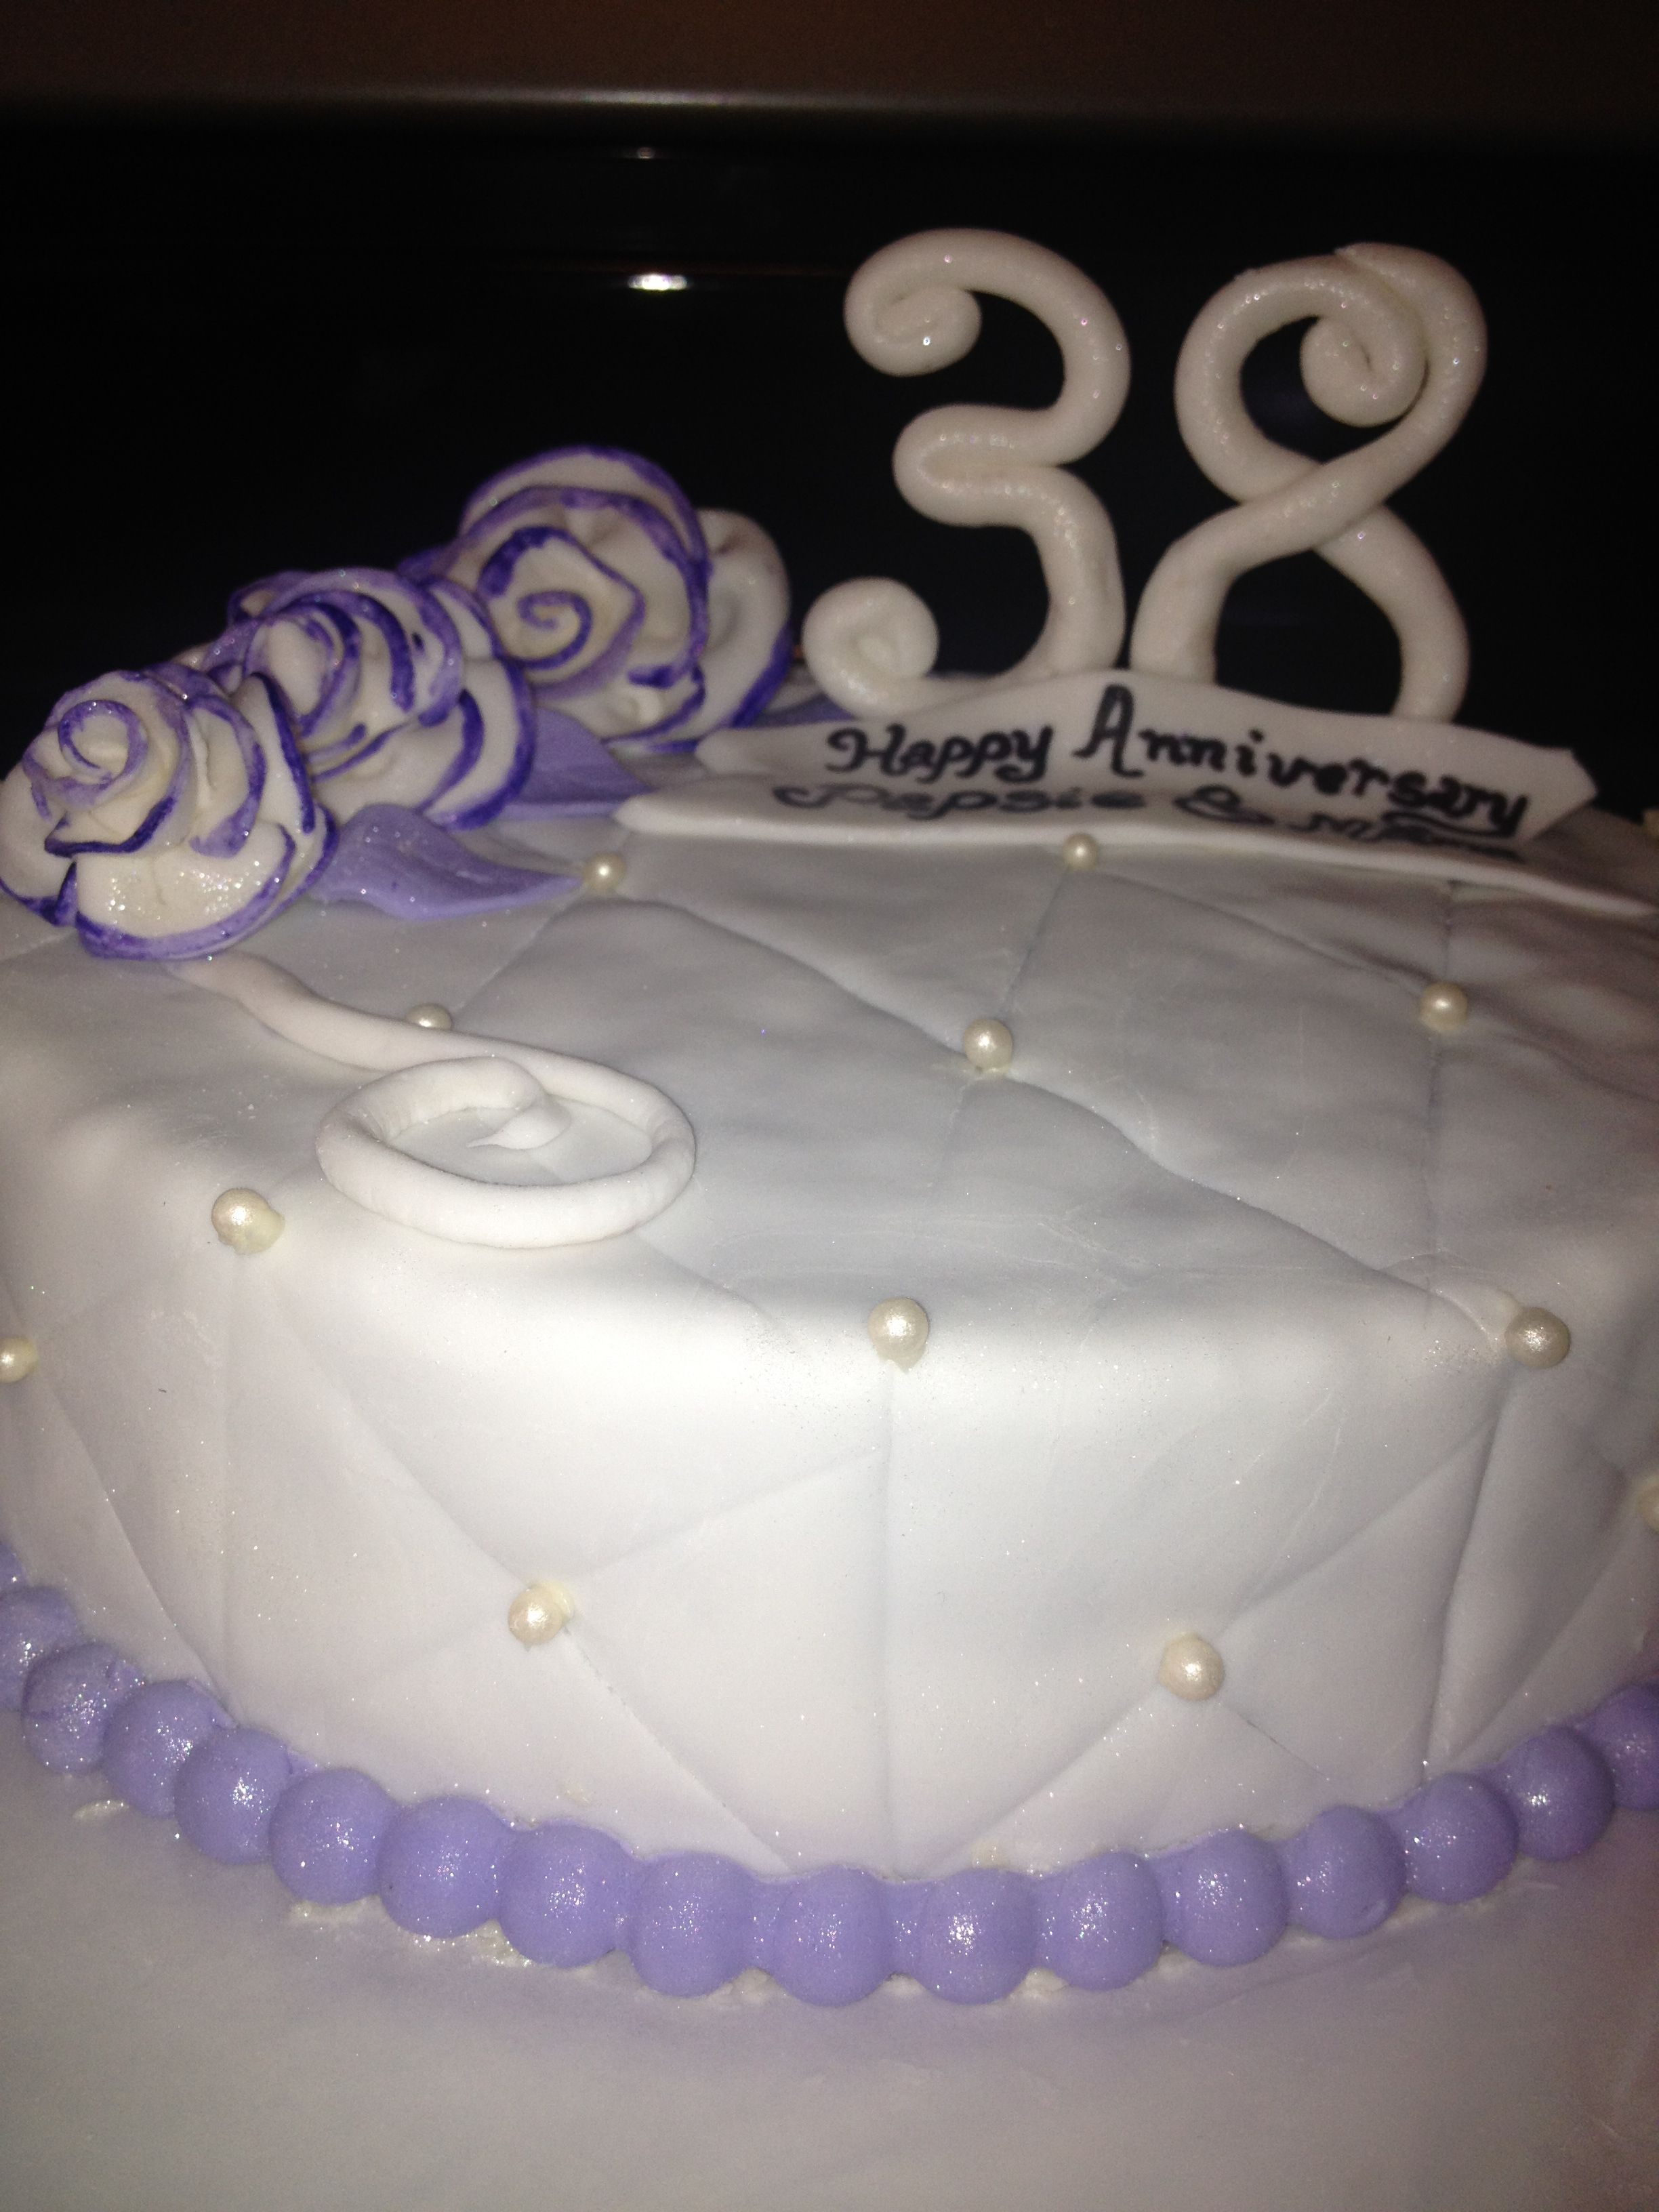 38th Wedding Anniversary in lavender 38th wedding